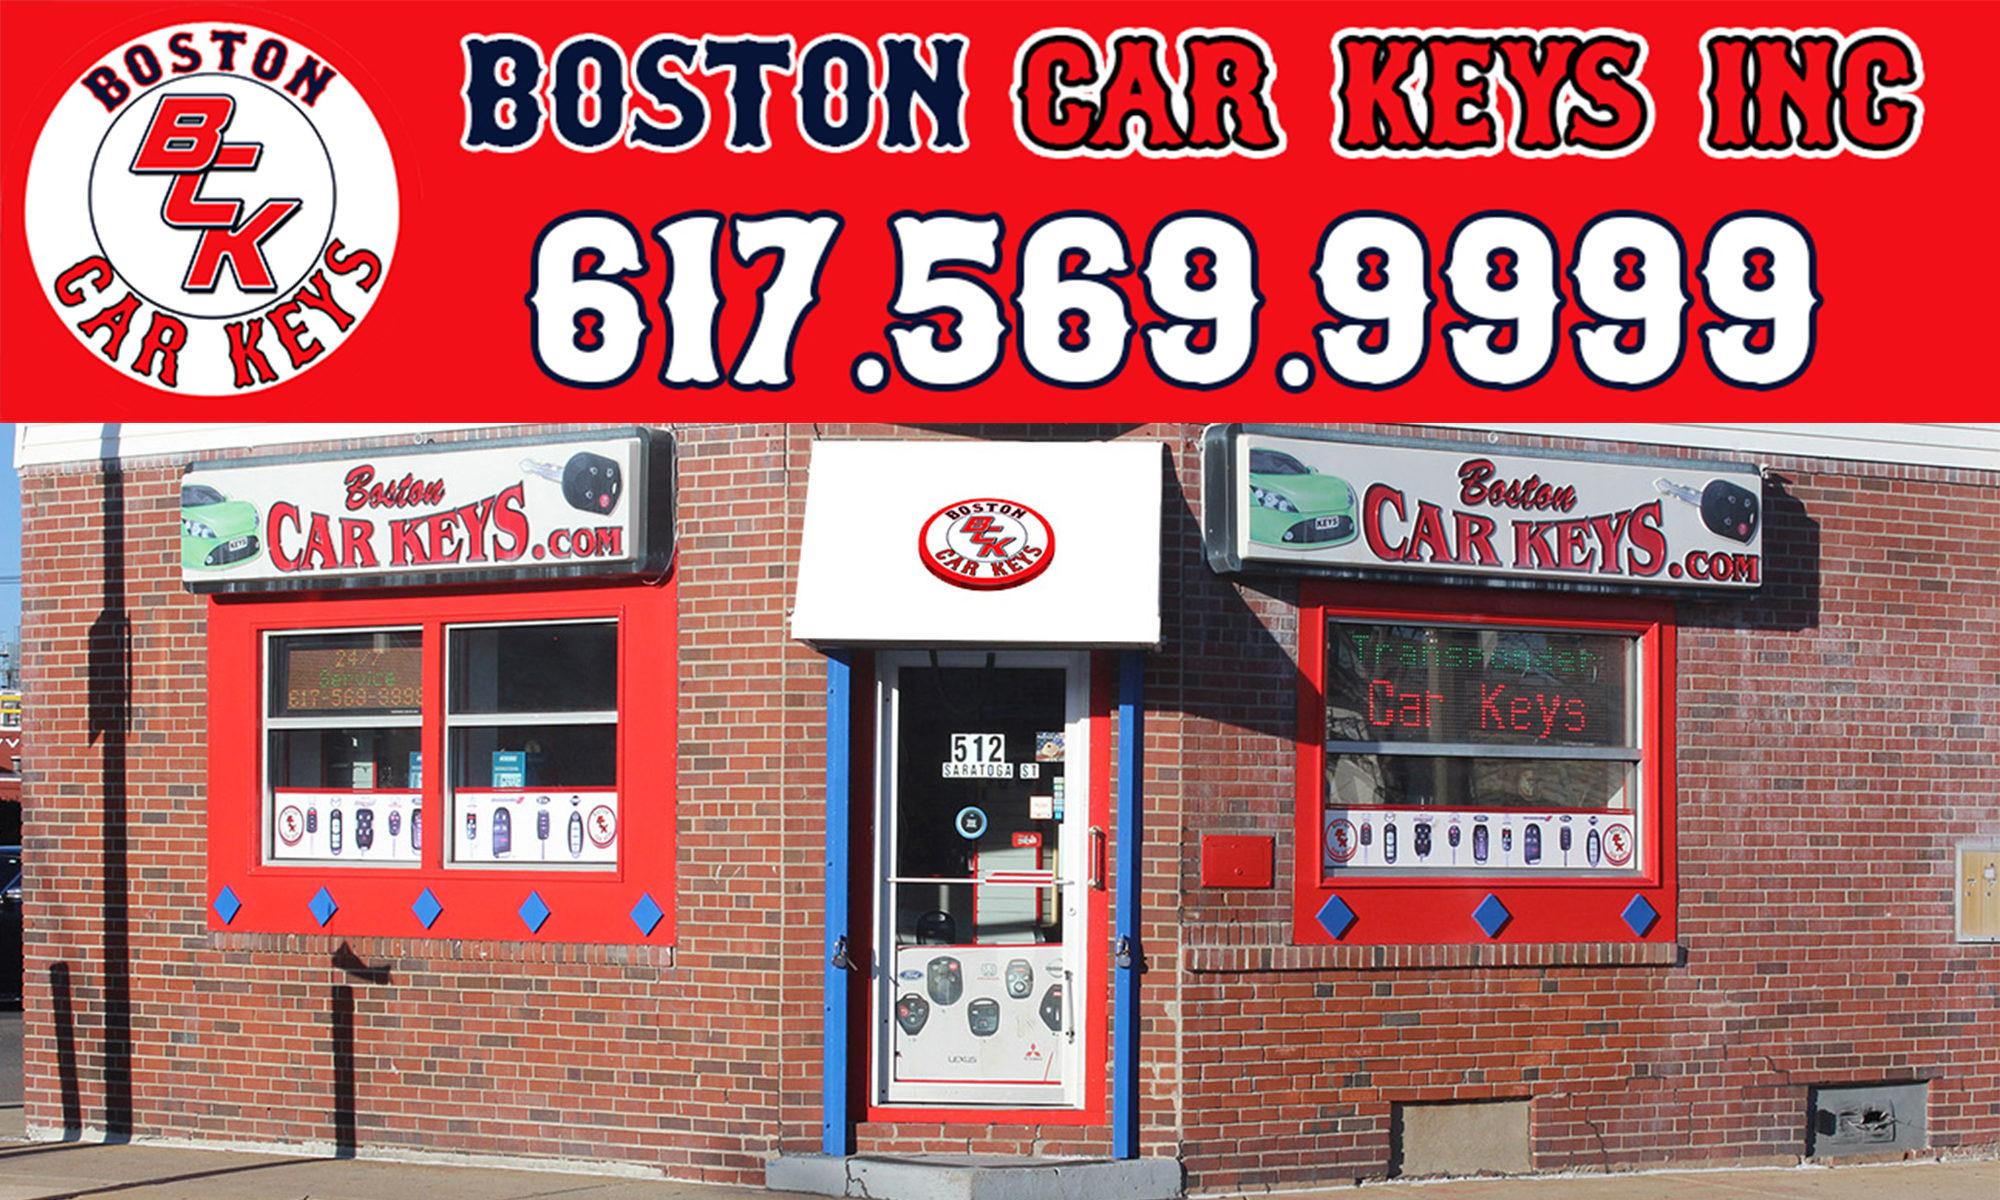 Boston Car Keys